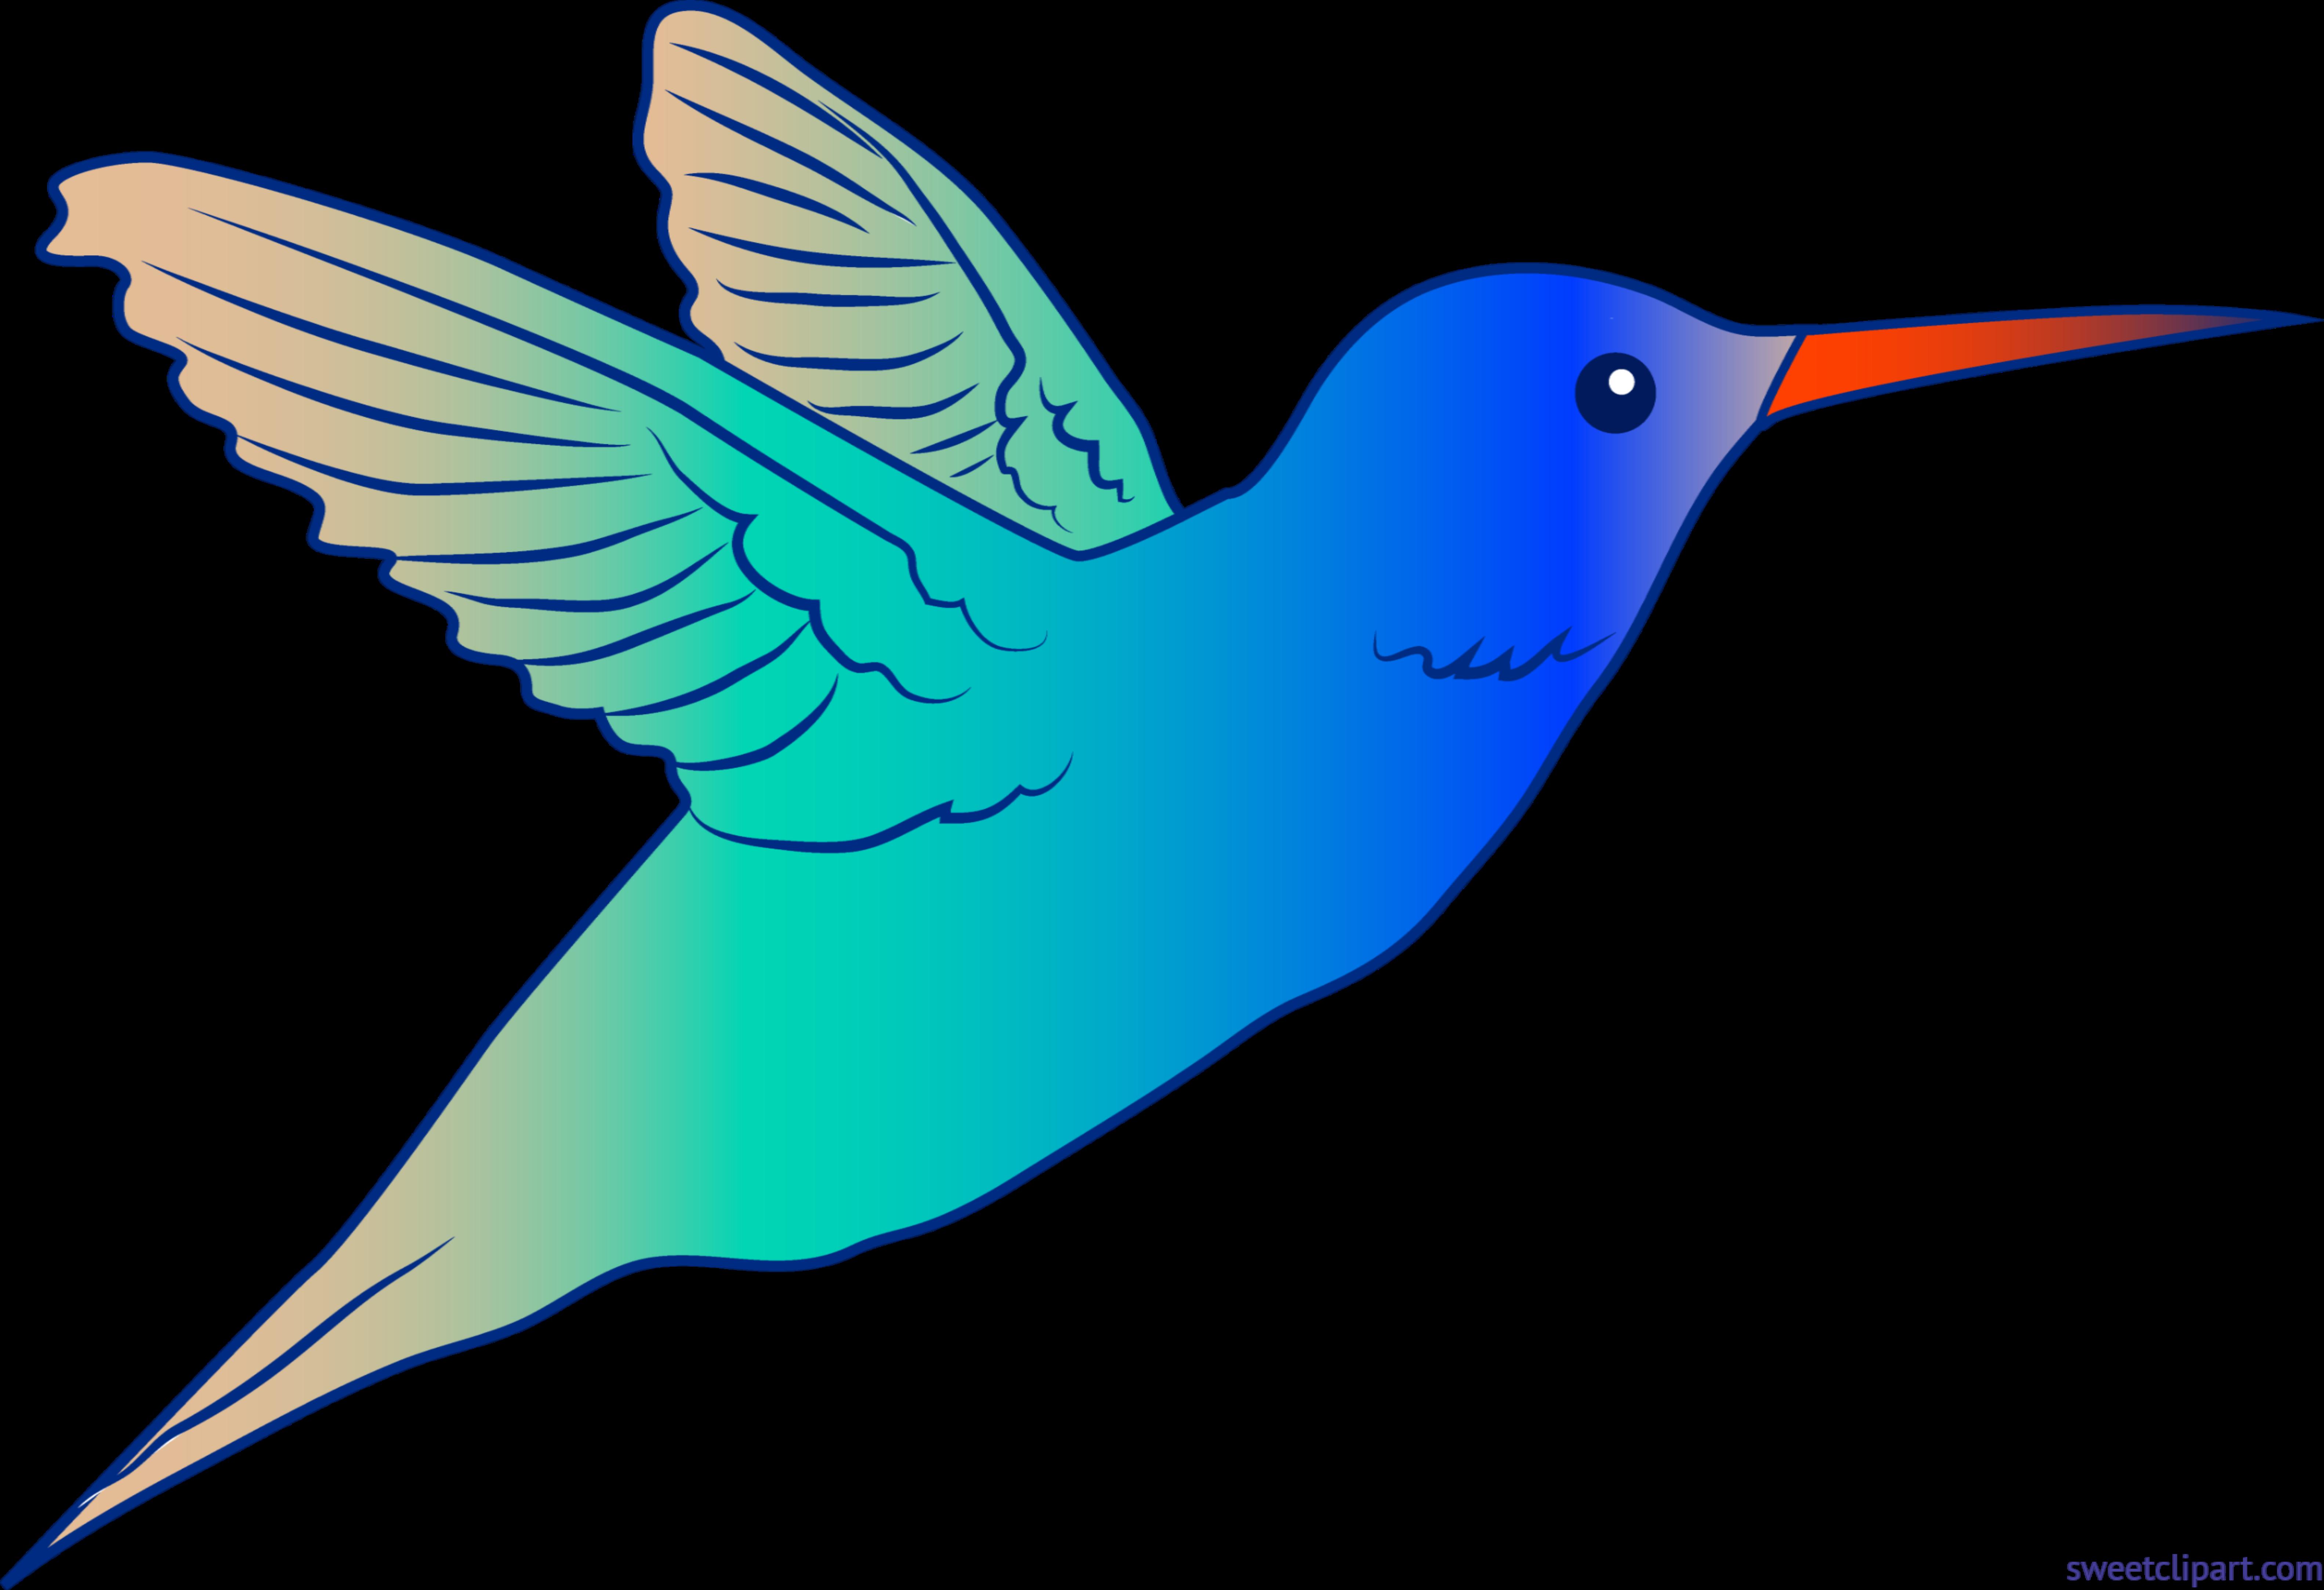 Hummingbird Clip Art - Hummingbird Clipart